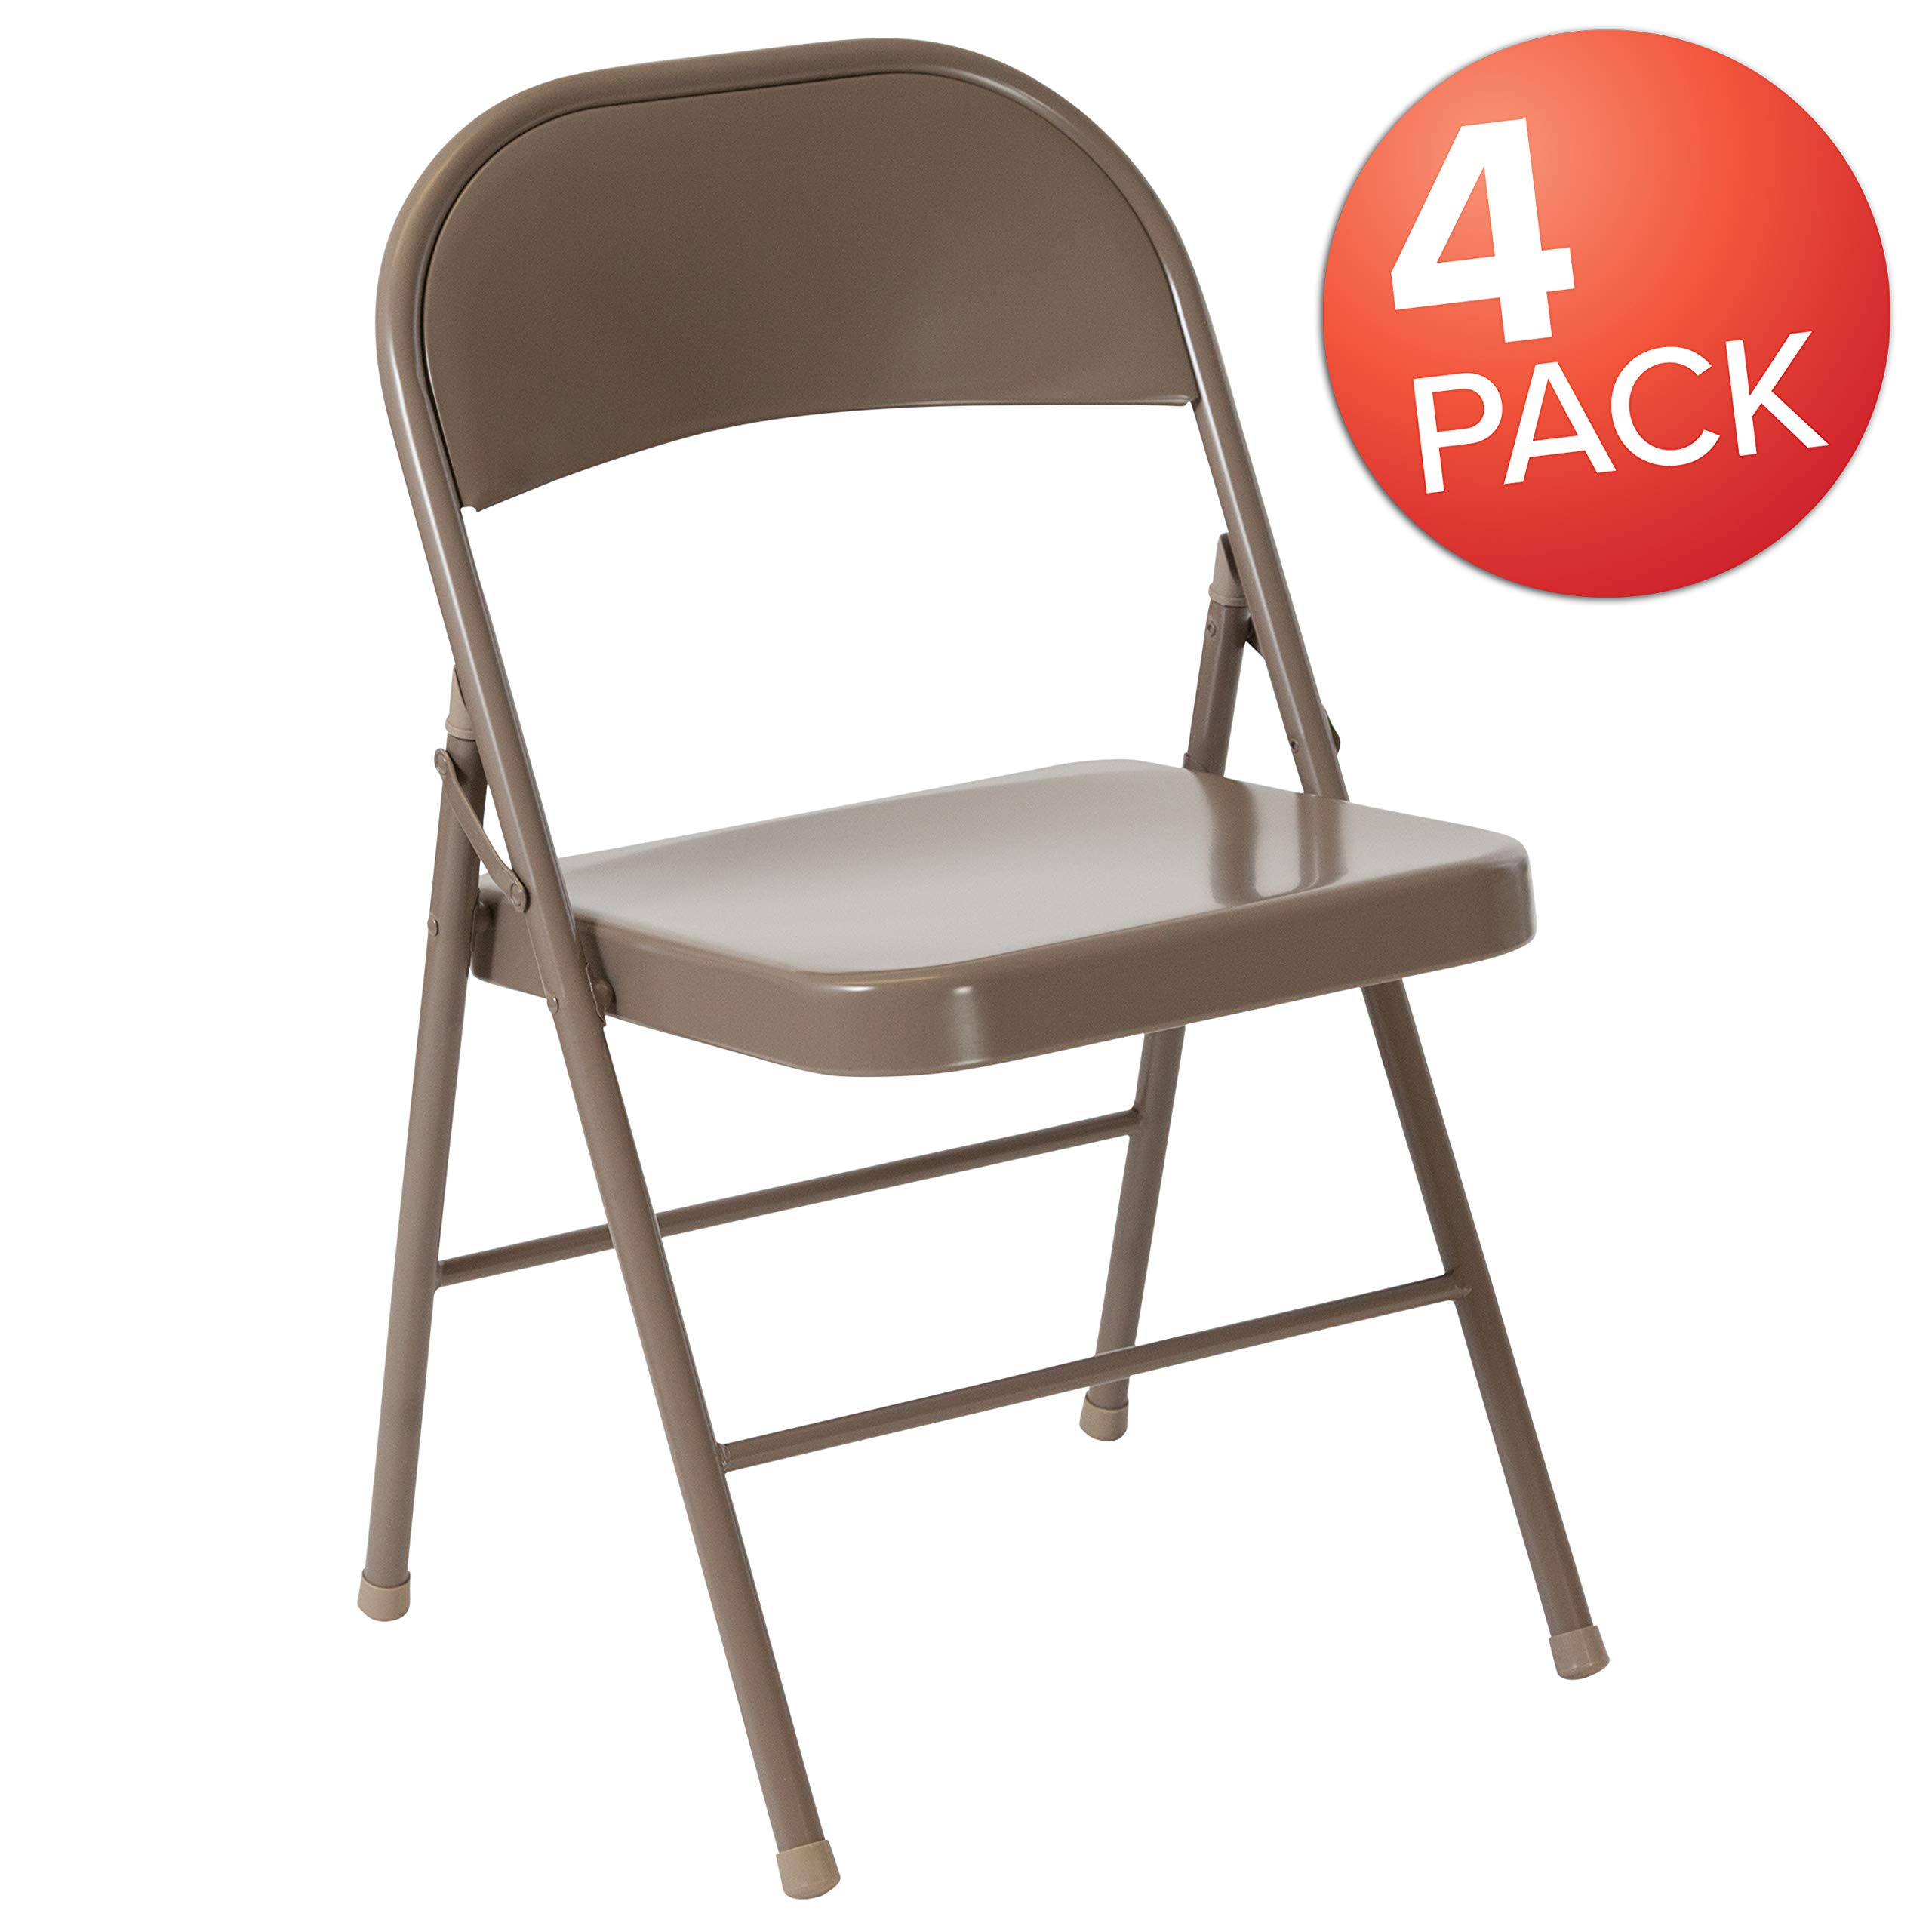 Flash Furniture 4 Pk. HERCULES Series Double Braced Beige Metal Folding Chair by Flash Furniture